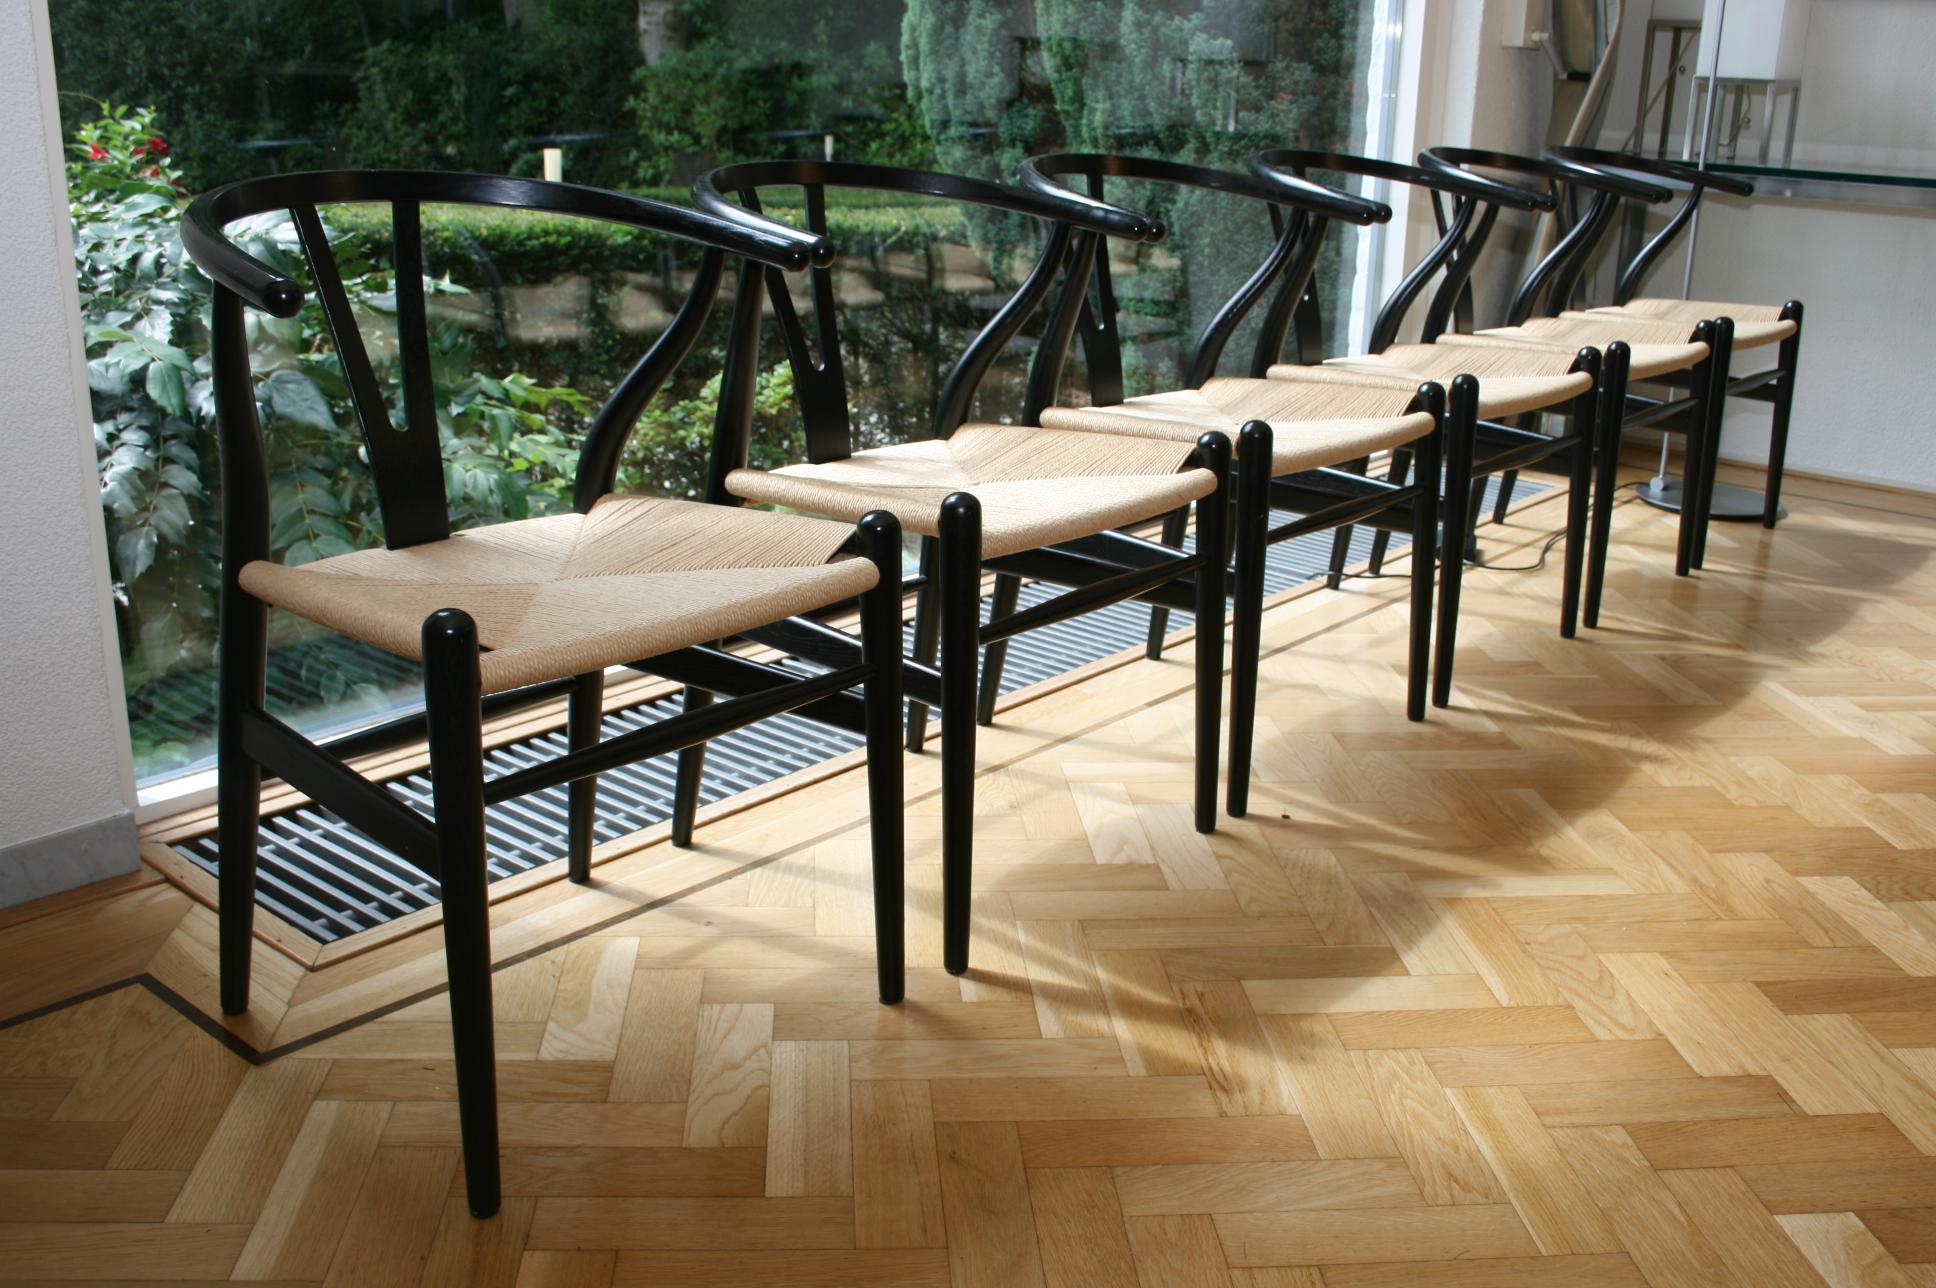 Fritz Hansen Design Stoelen.About Carl Hansen Son